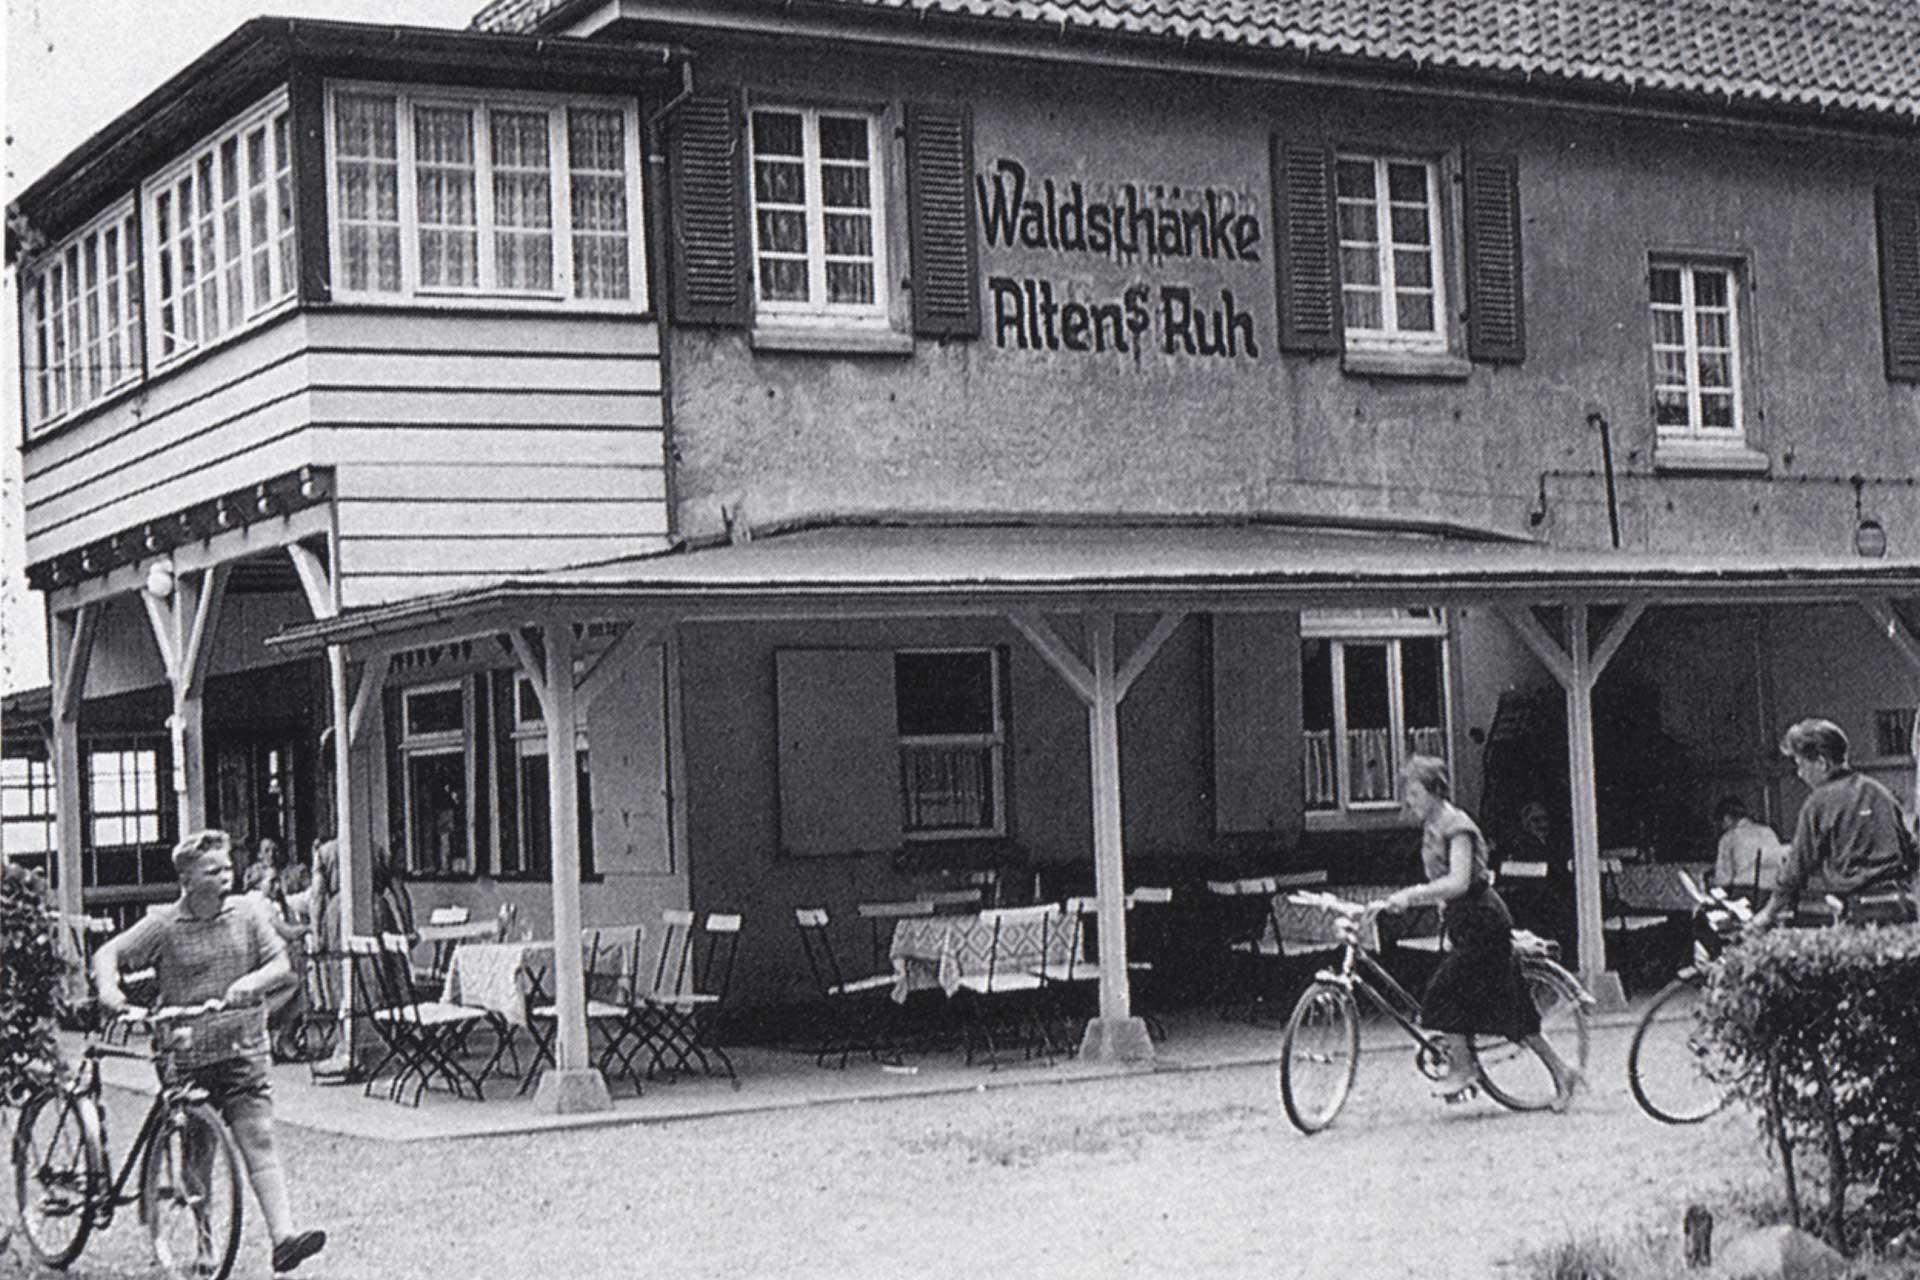 Historisches Foto Alten's Ruh in Wunstorf